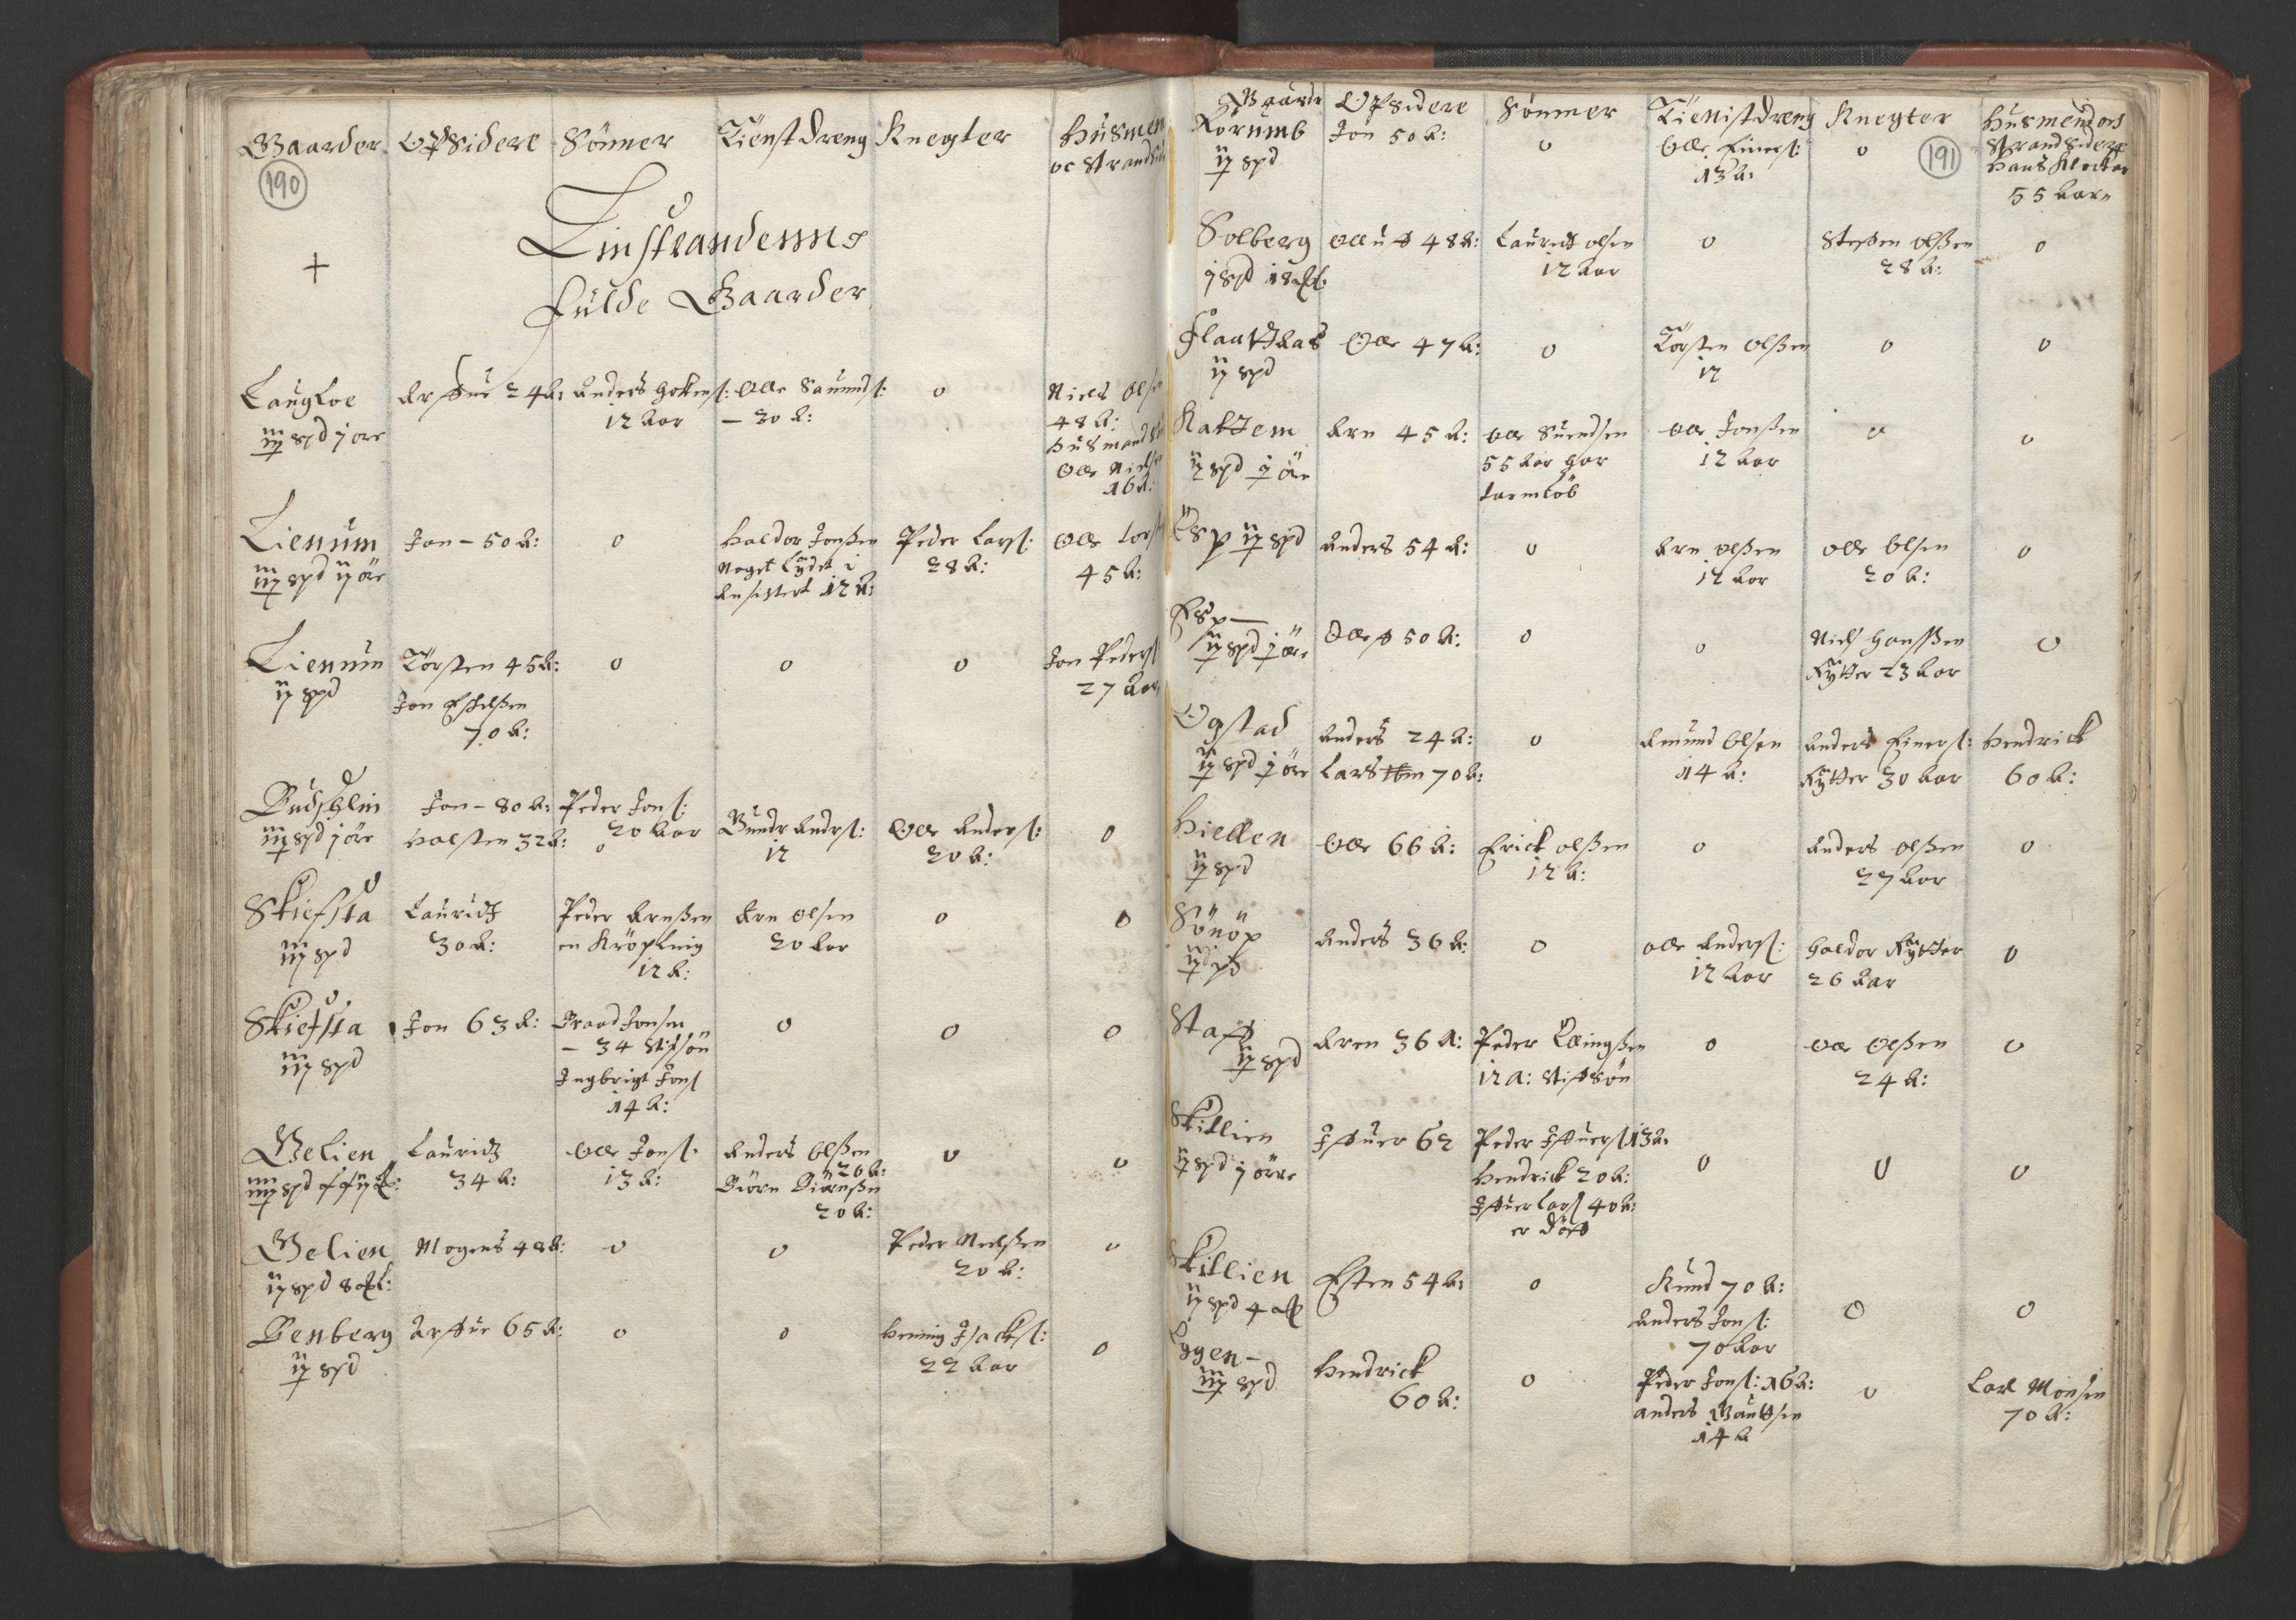 RA, Fogdenes og sorenskrivernes manntall 1664-1666, nr. 18: Gauldal fogderi, Strinda fogderi og Orkdal fogderi, 1664, s. 190-191